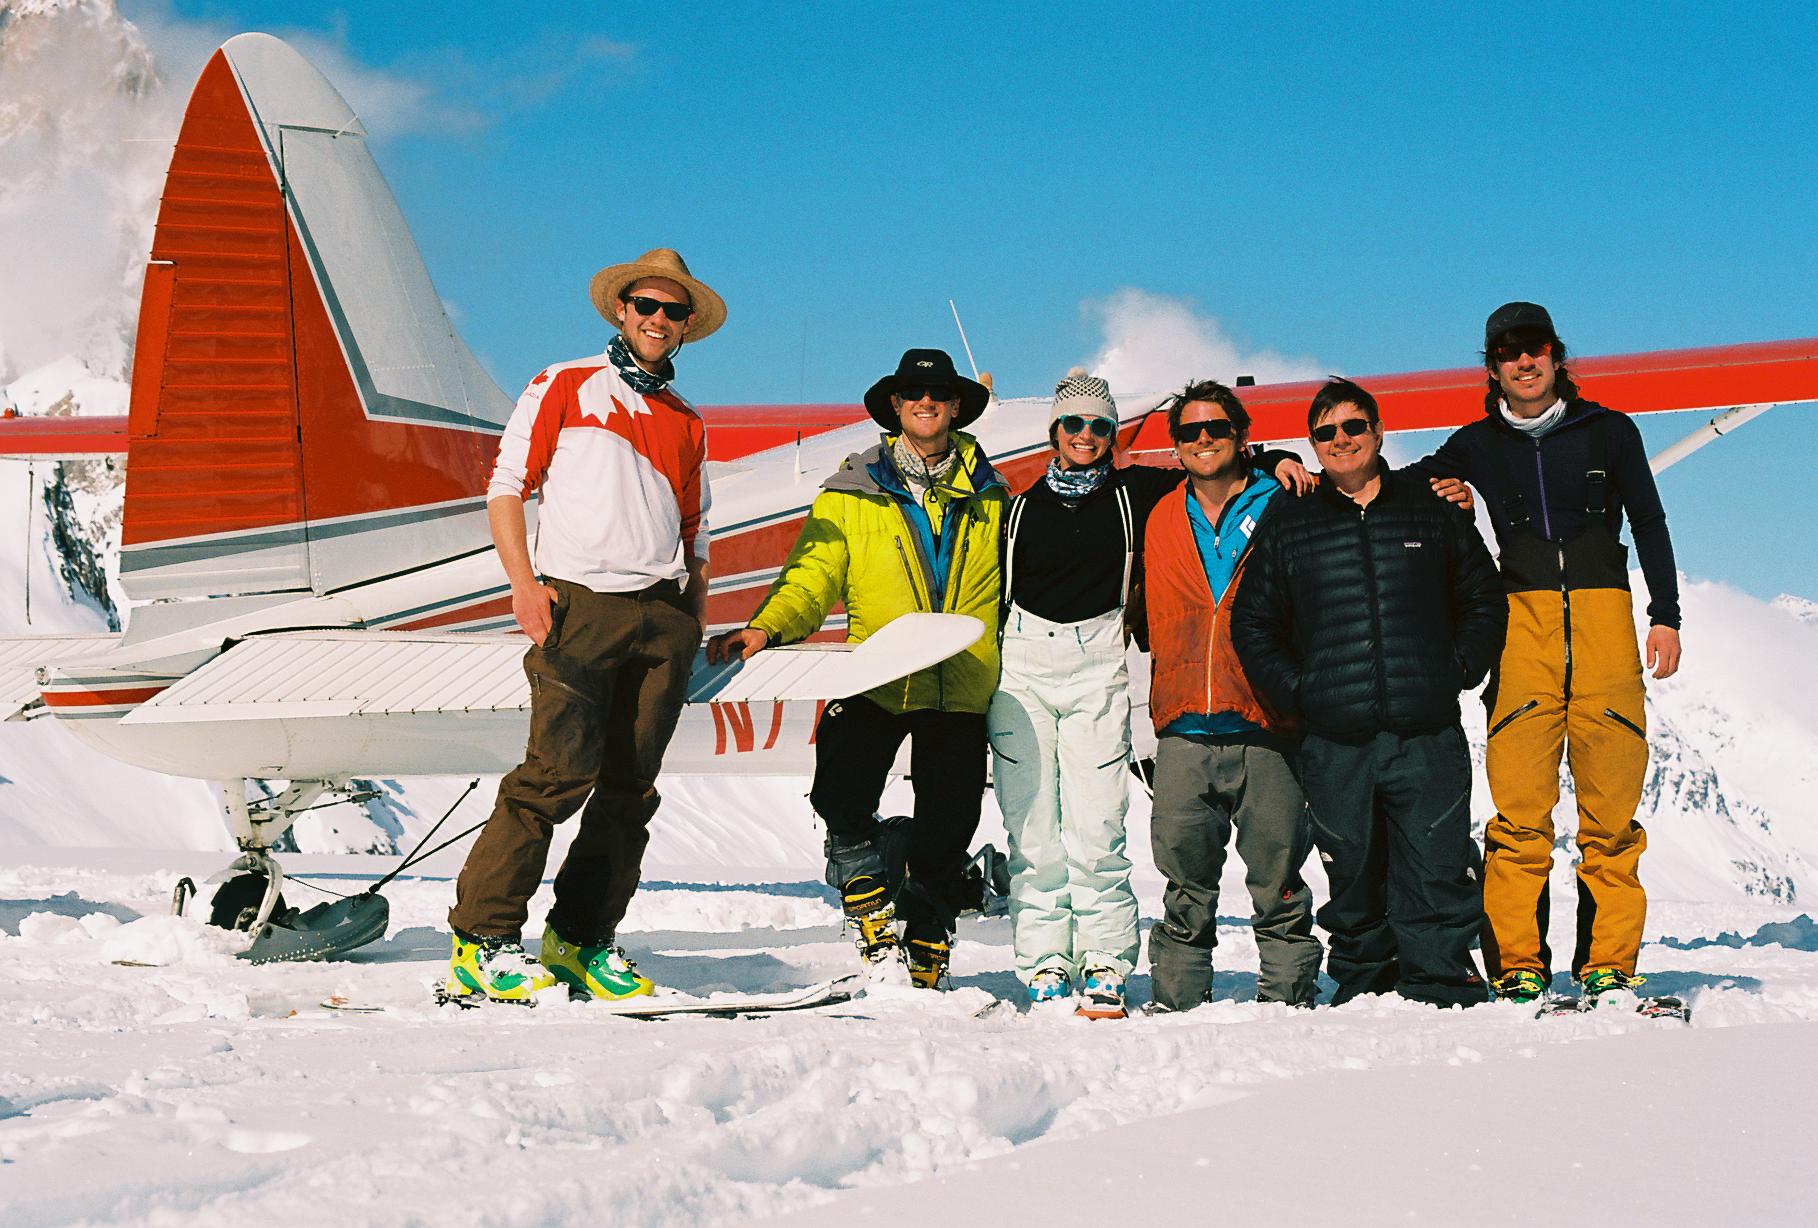 Tad (left) and crew